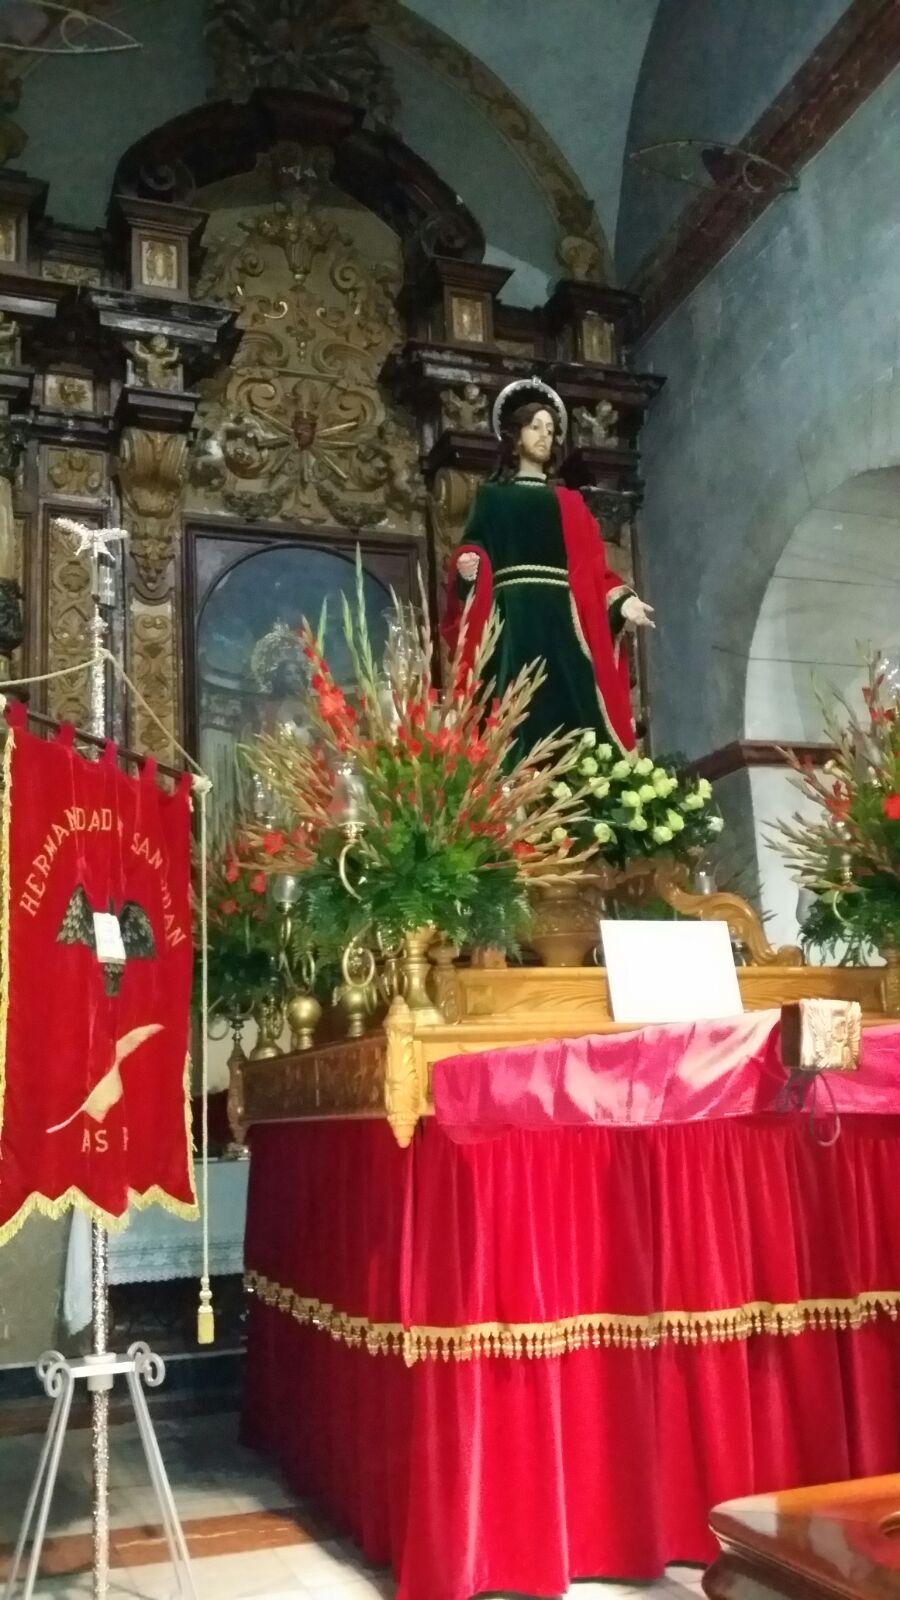 Estandarte e imagen de San Juan evangelista